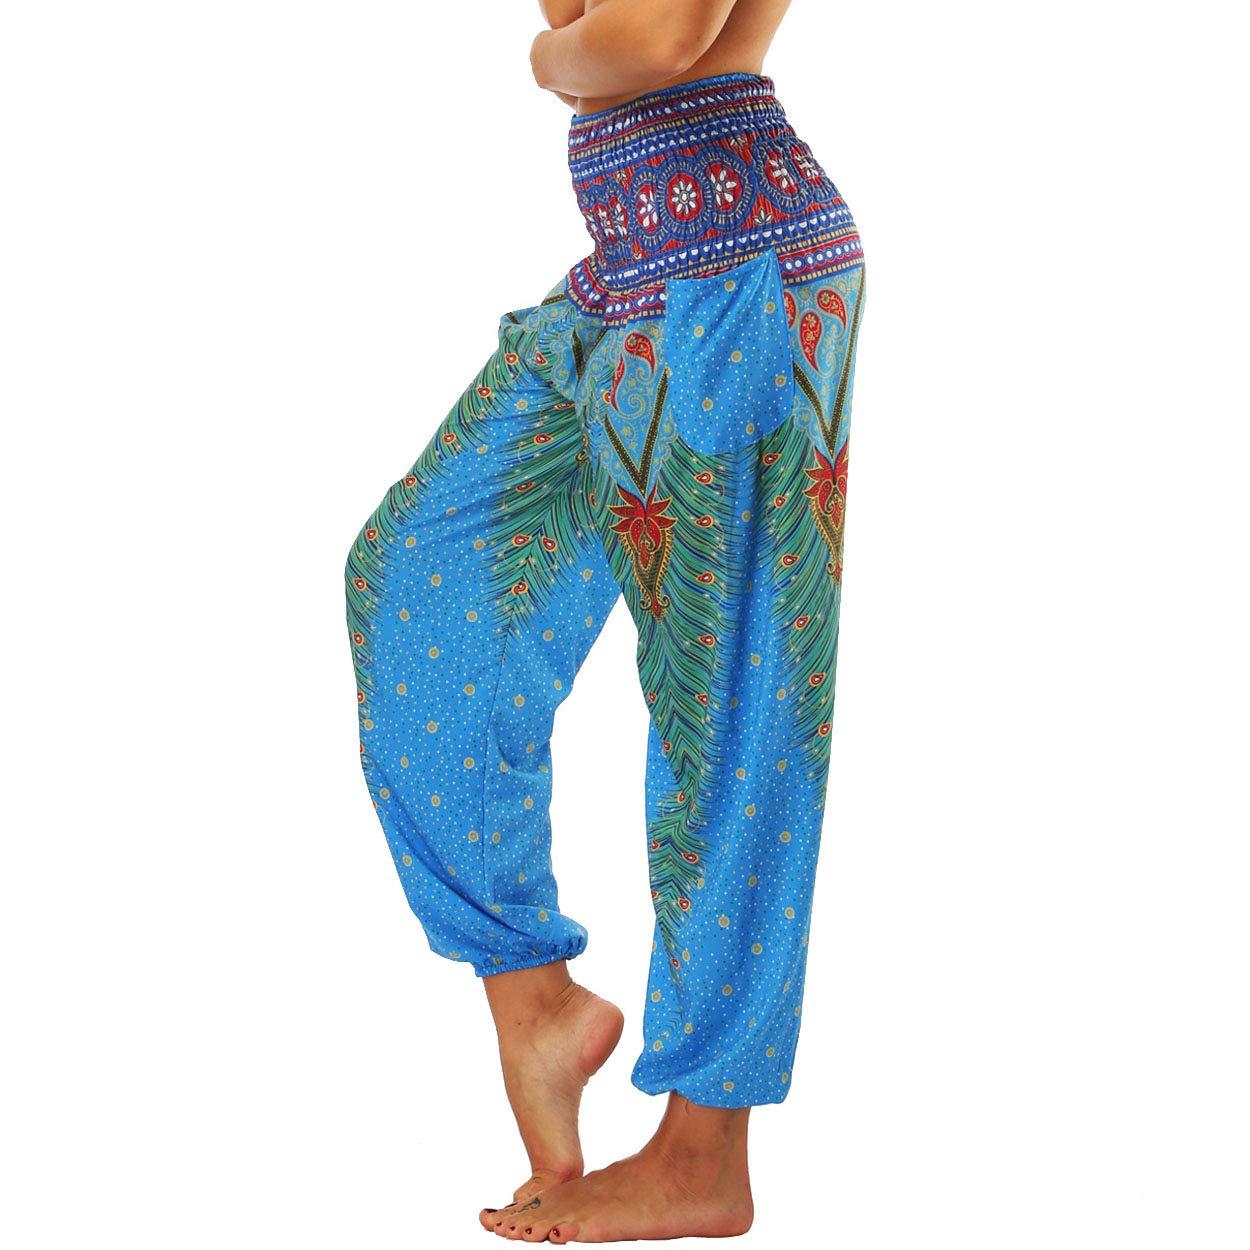 Nuofengkudu Dame Hippie Hose Pumphose Haremshose Boho Gemustert Gesmockte Taille mit Taschen Freizeithose Sommerhose Yogahose